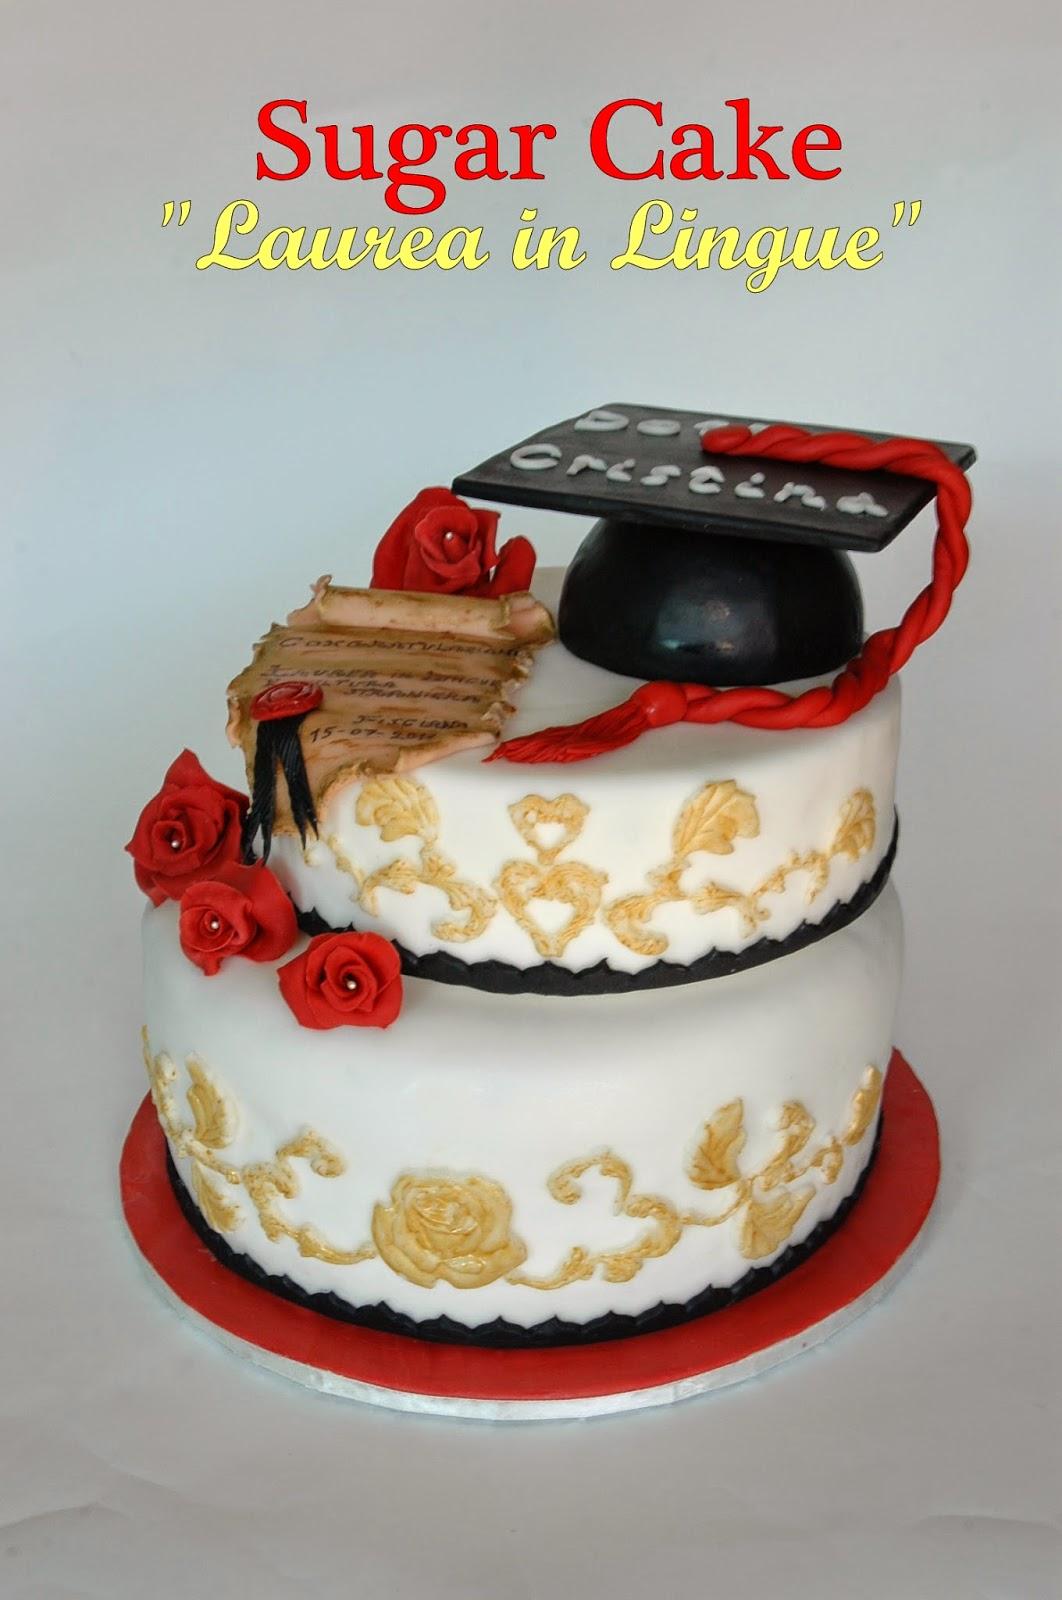 Pasticci in famiglia sugar cake laurea in lingue for Laurea in design